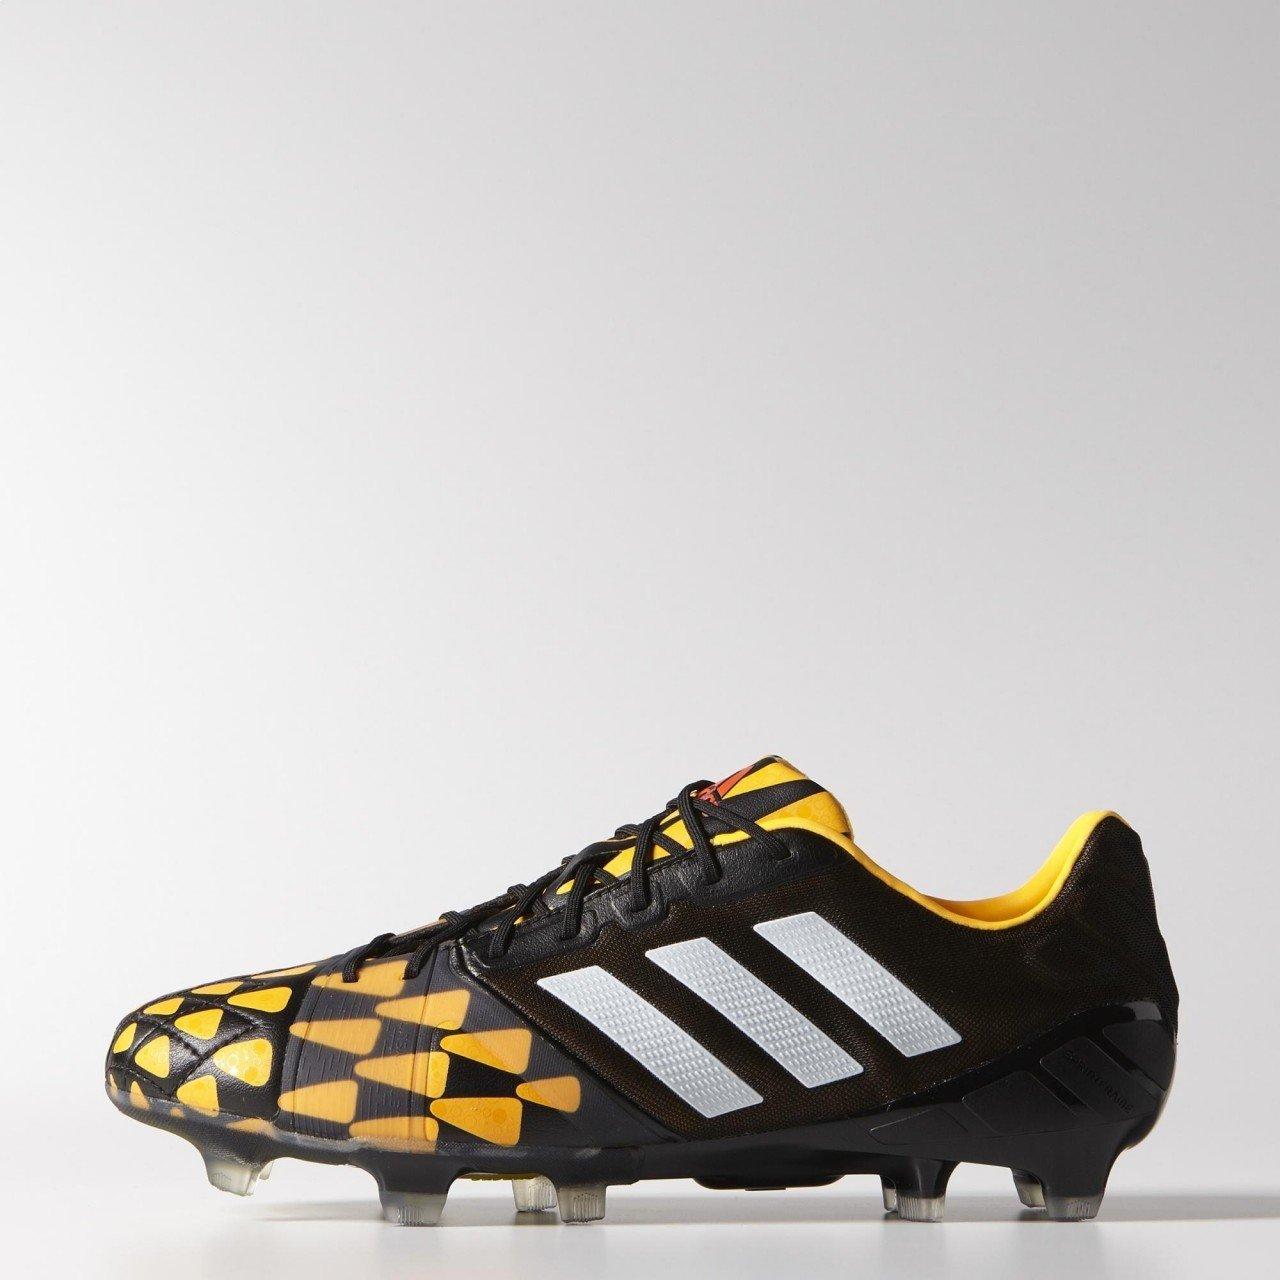 Adidas Performance Nitrocharge 1.0 FG M18429, Fußballschuhe - 40 2 3 EU